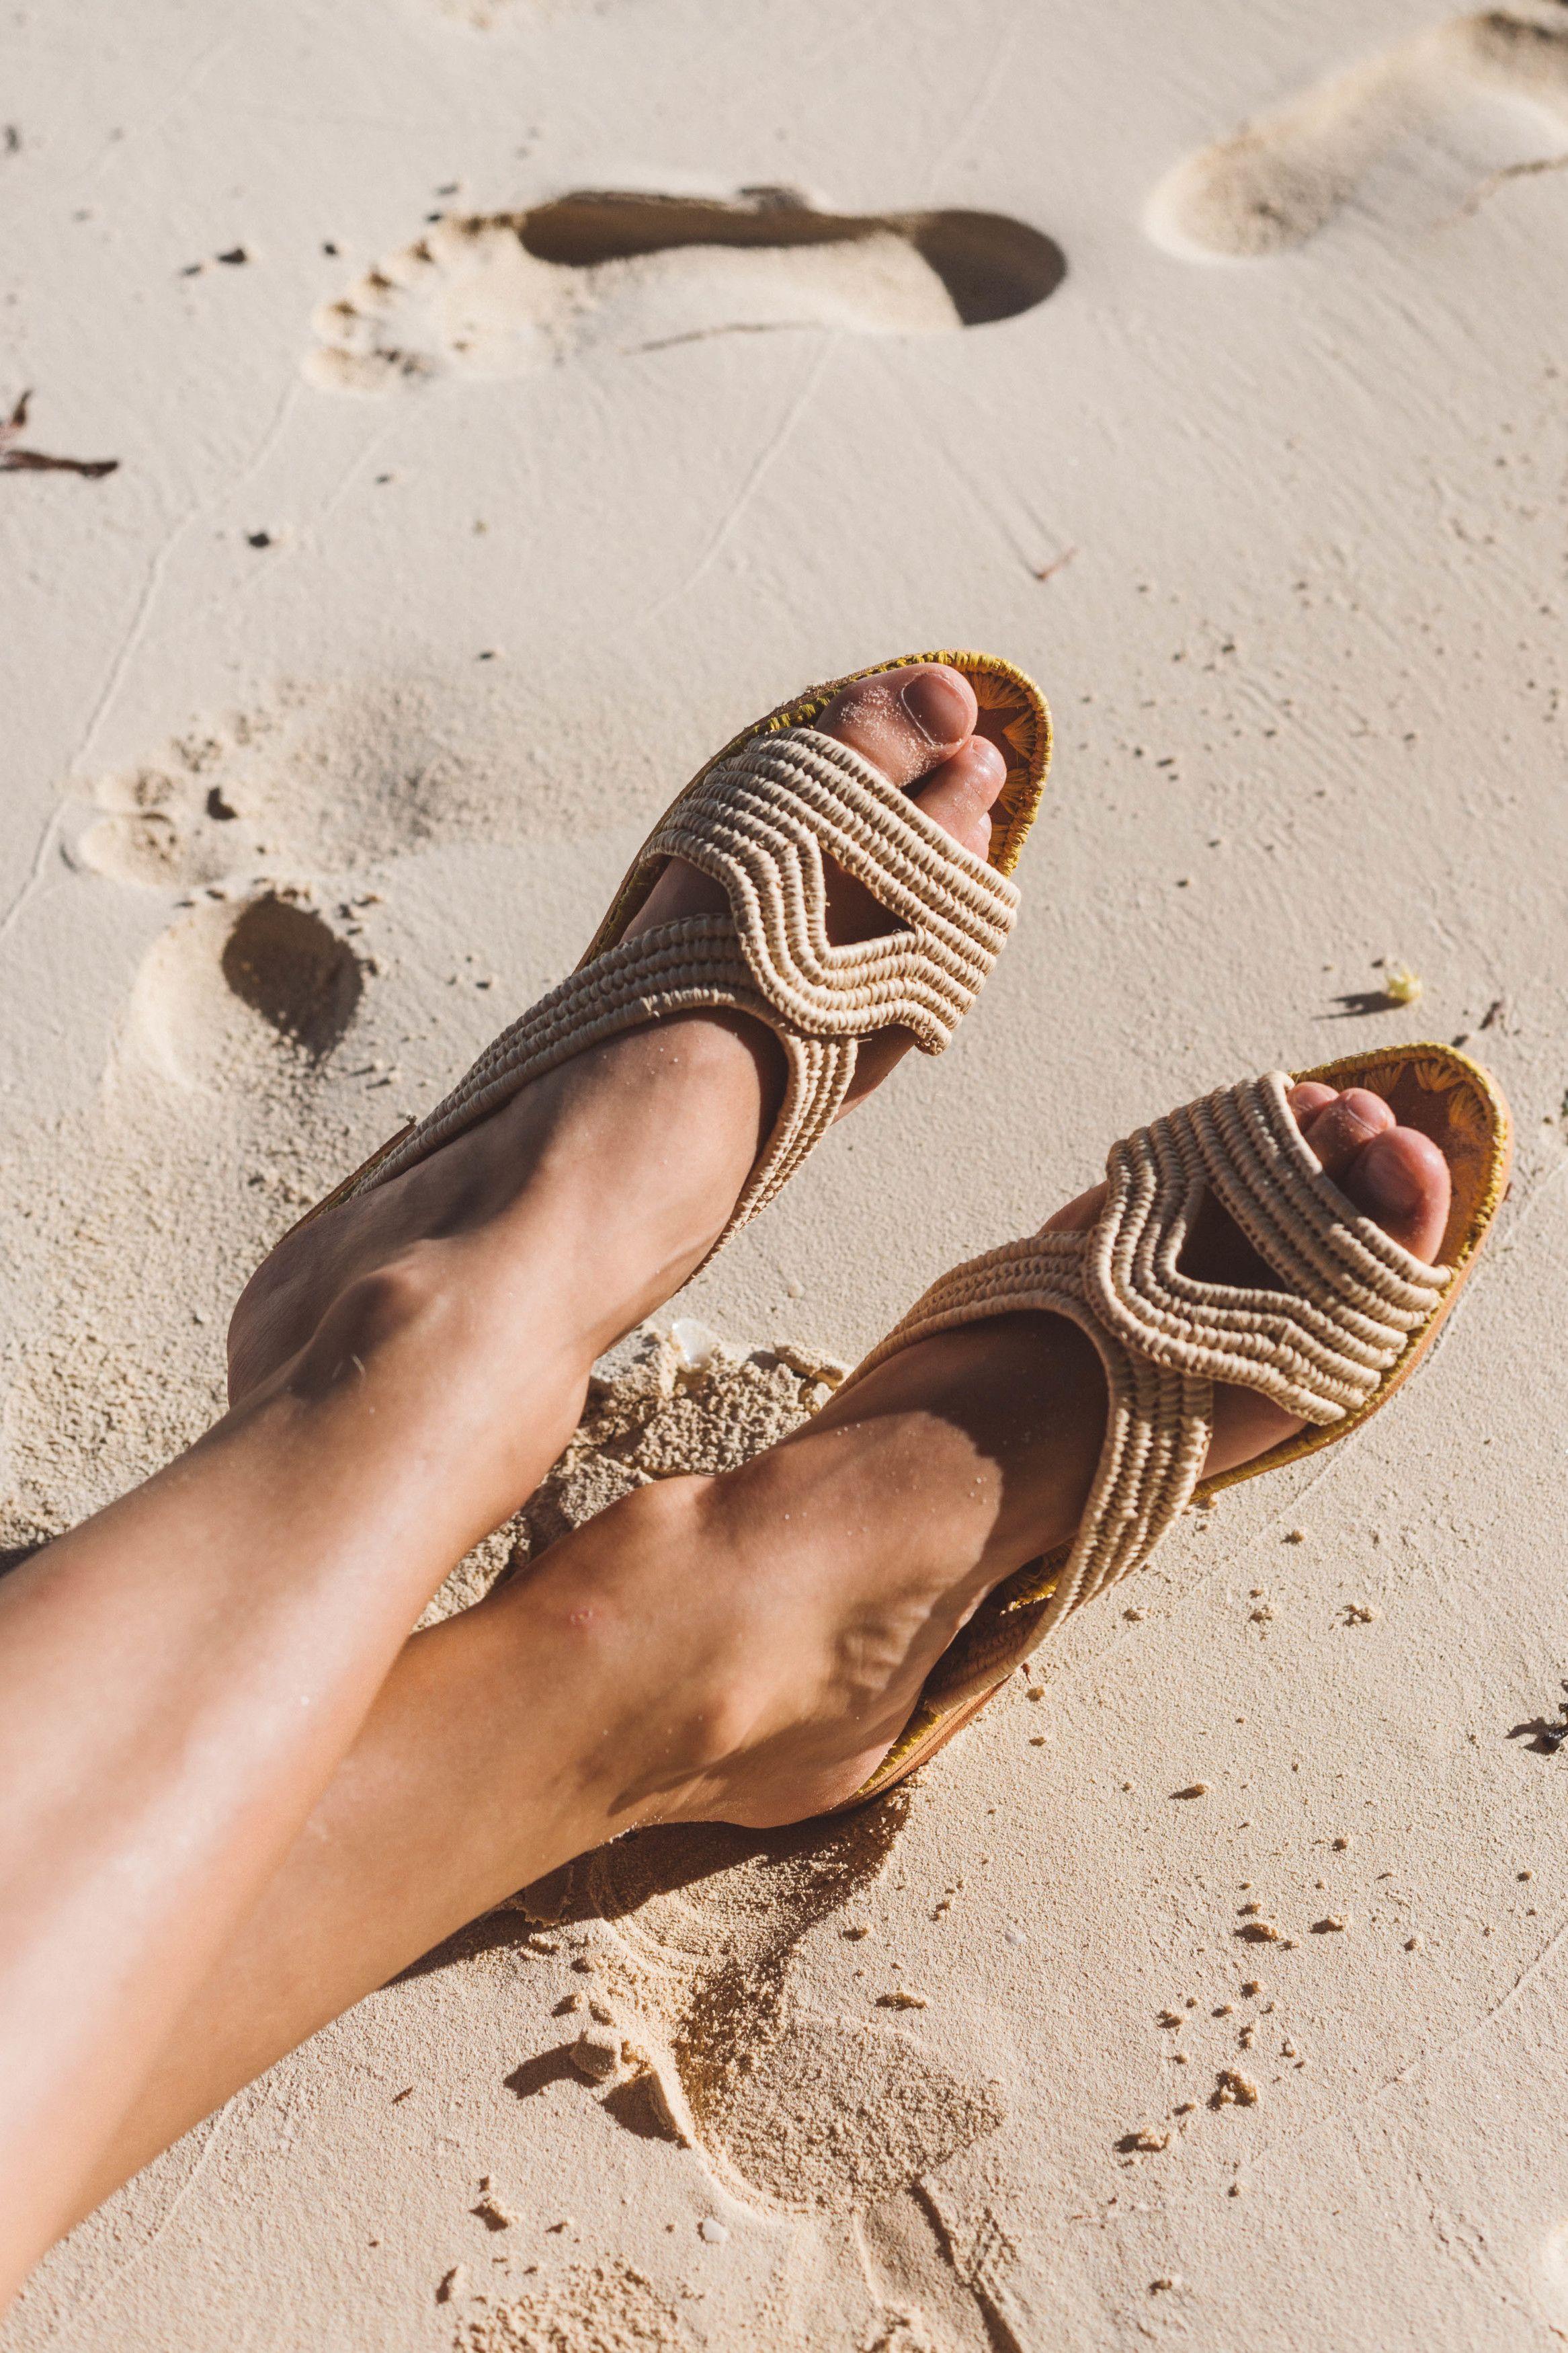 Rafia Handmade In Raphia ShoesNatural Sandals Sandy Feet And qMVpGSUz